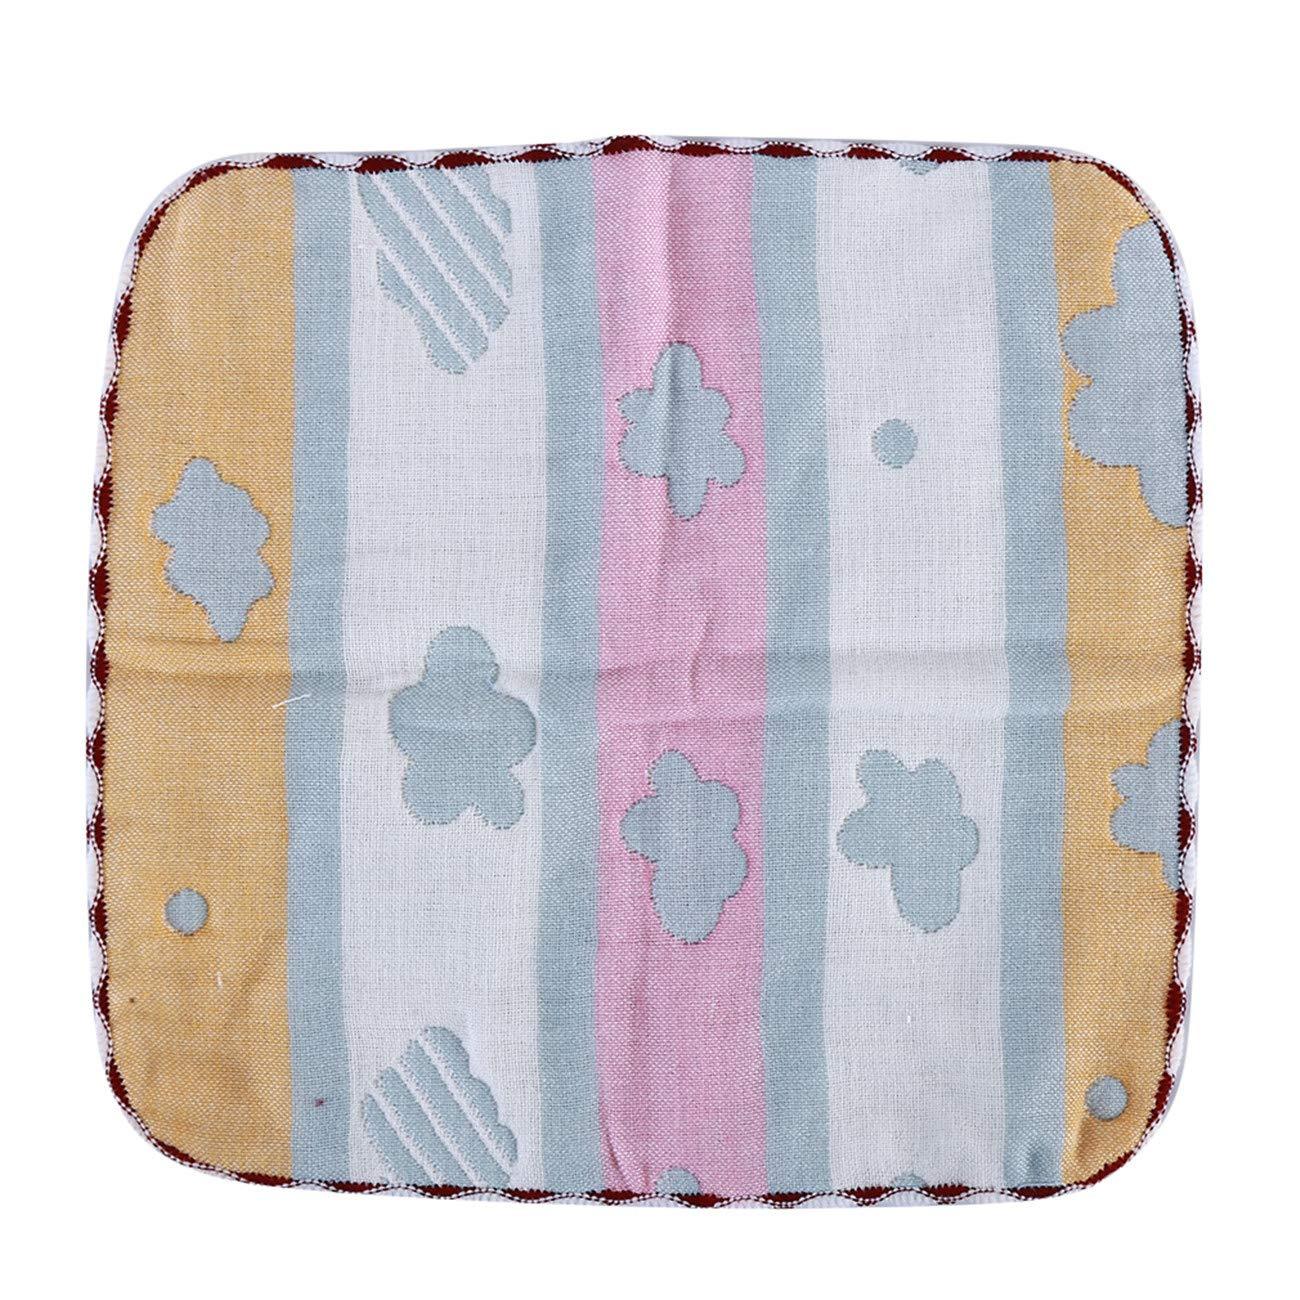 ZALING Six Layers Cotton Baby Towel Infants Comfort Cute Cartoon Kids Soft Face Towel Baby Burp Cloths Cloud Blue